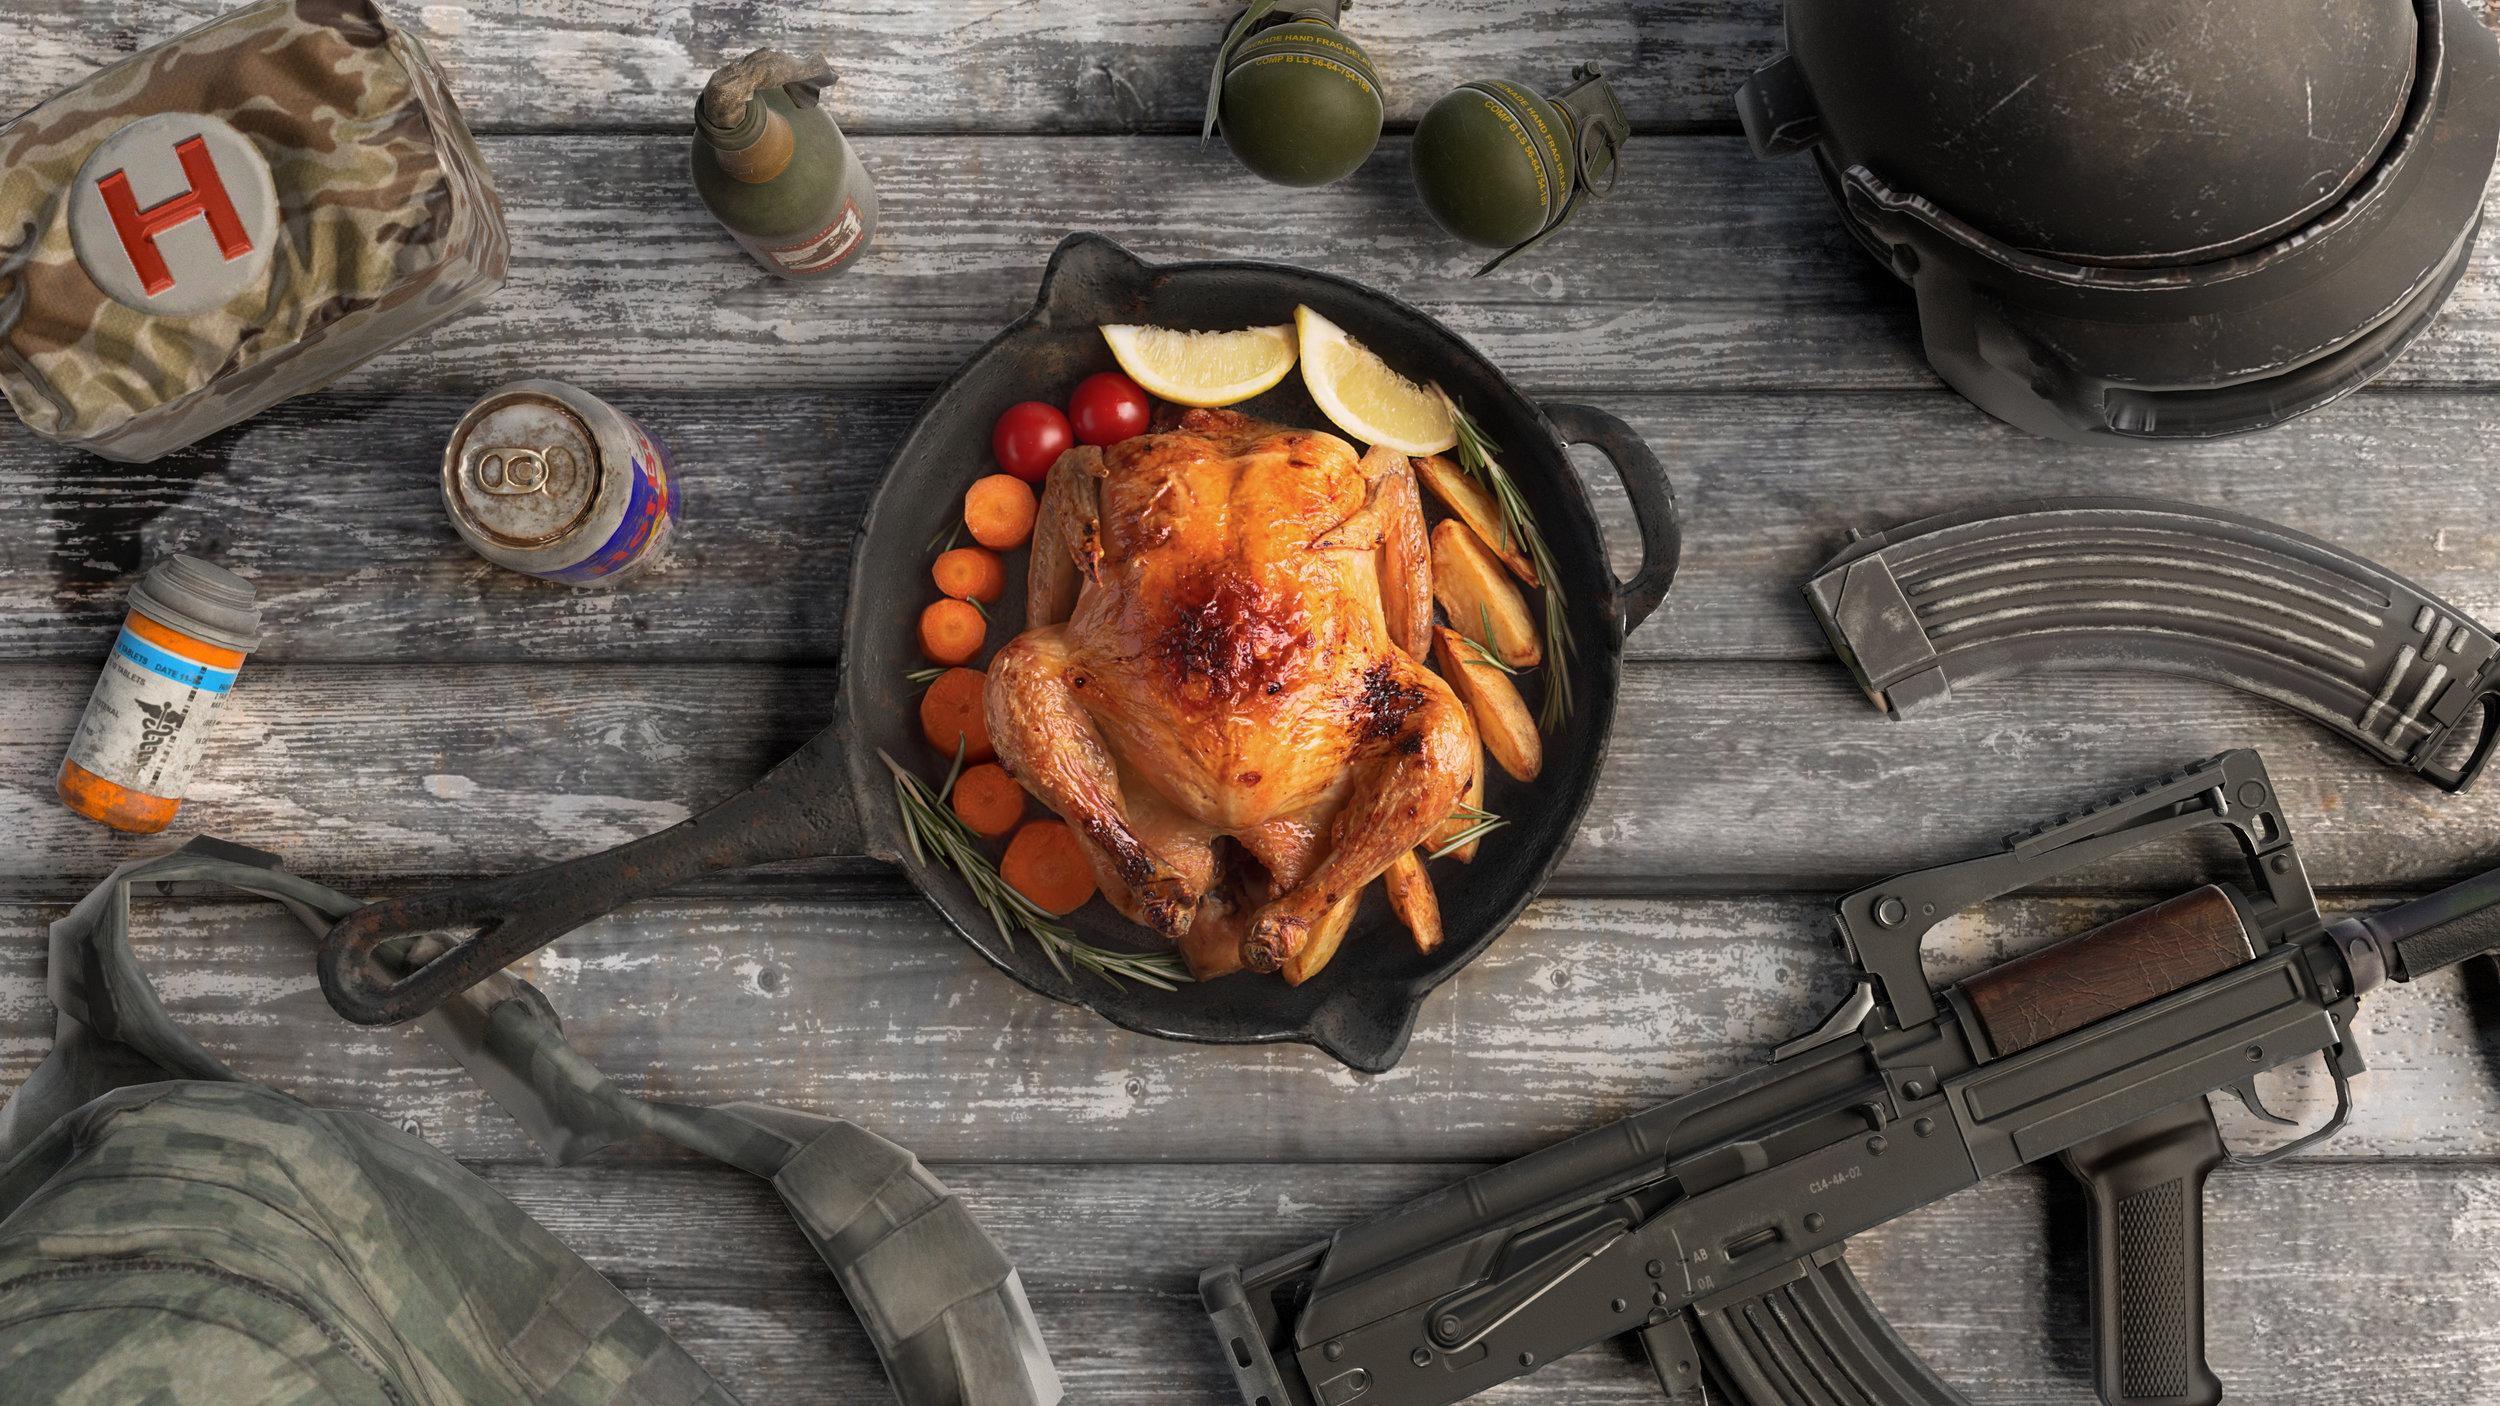 PUBG-chicken dinner.jpg